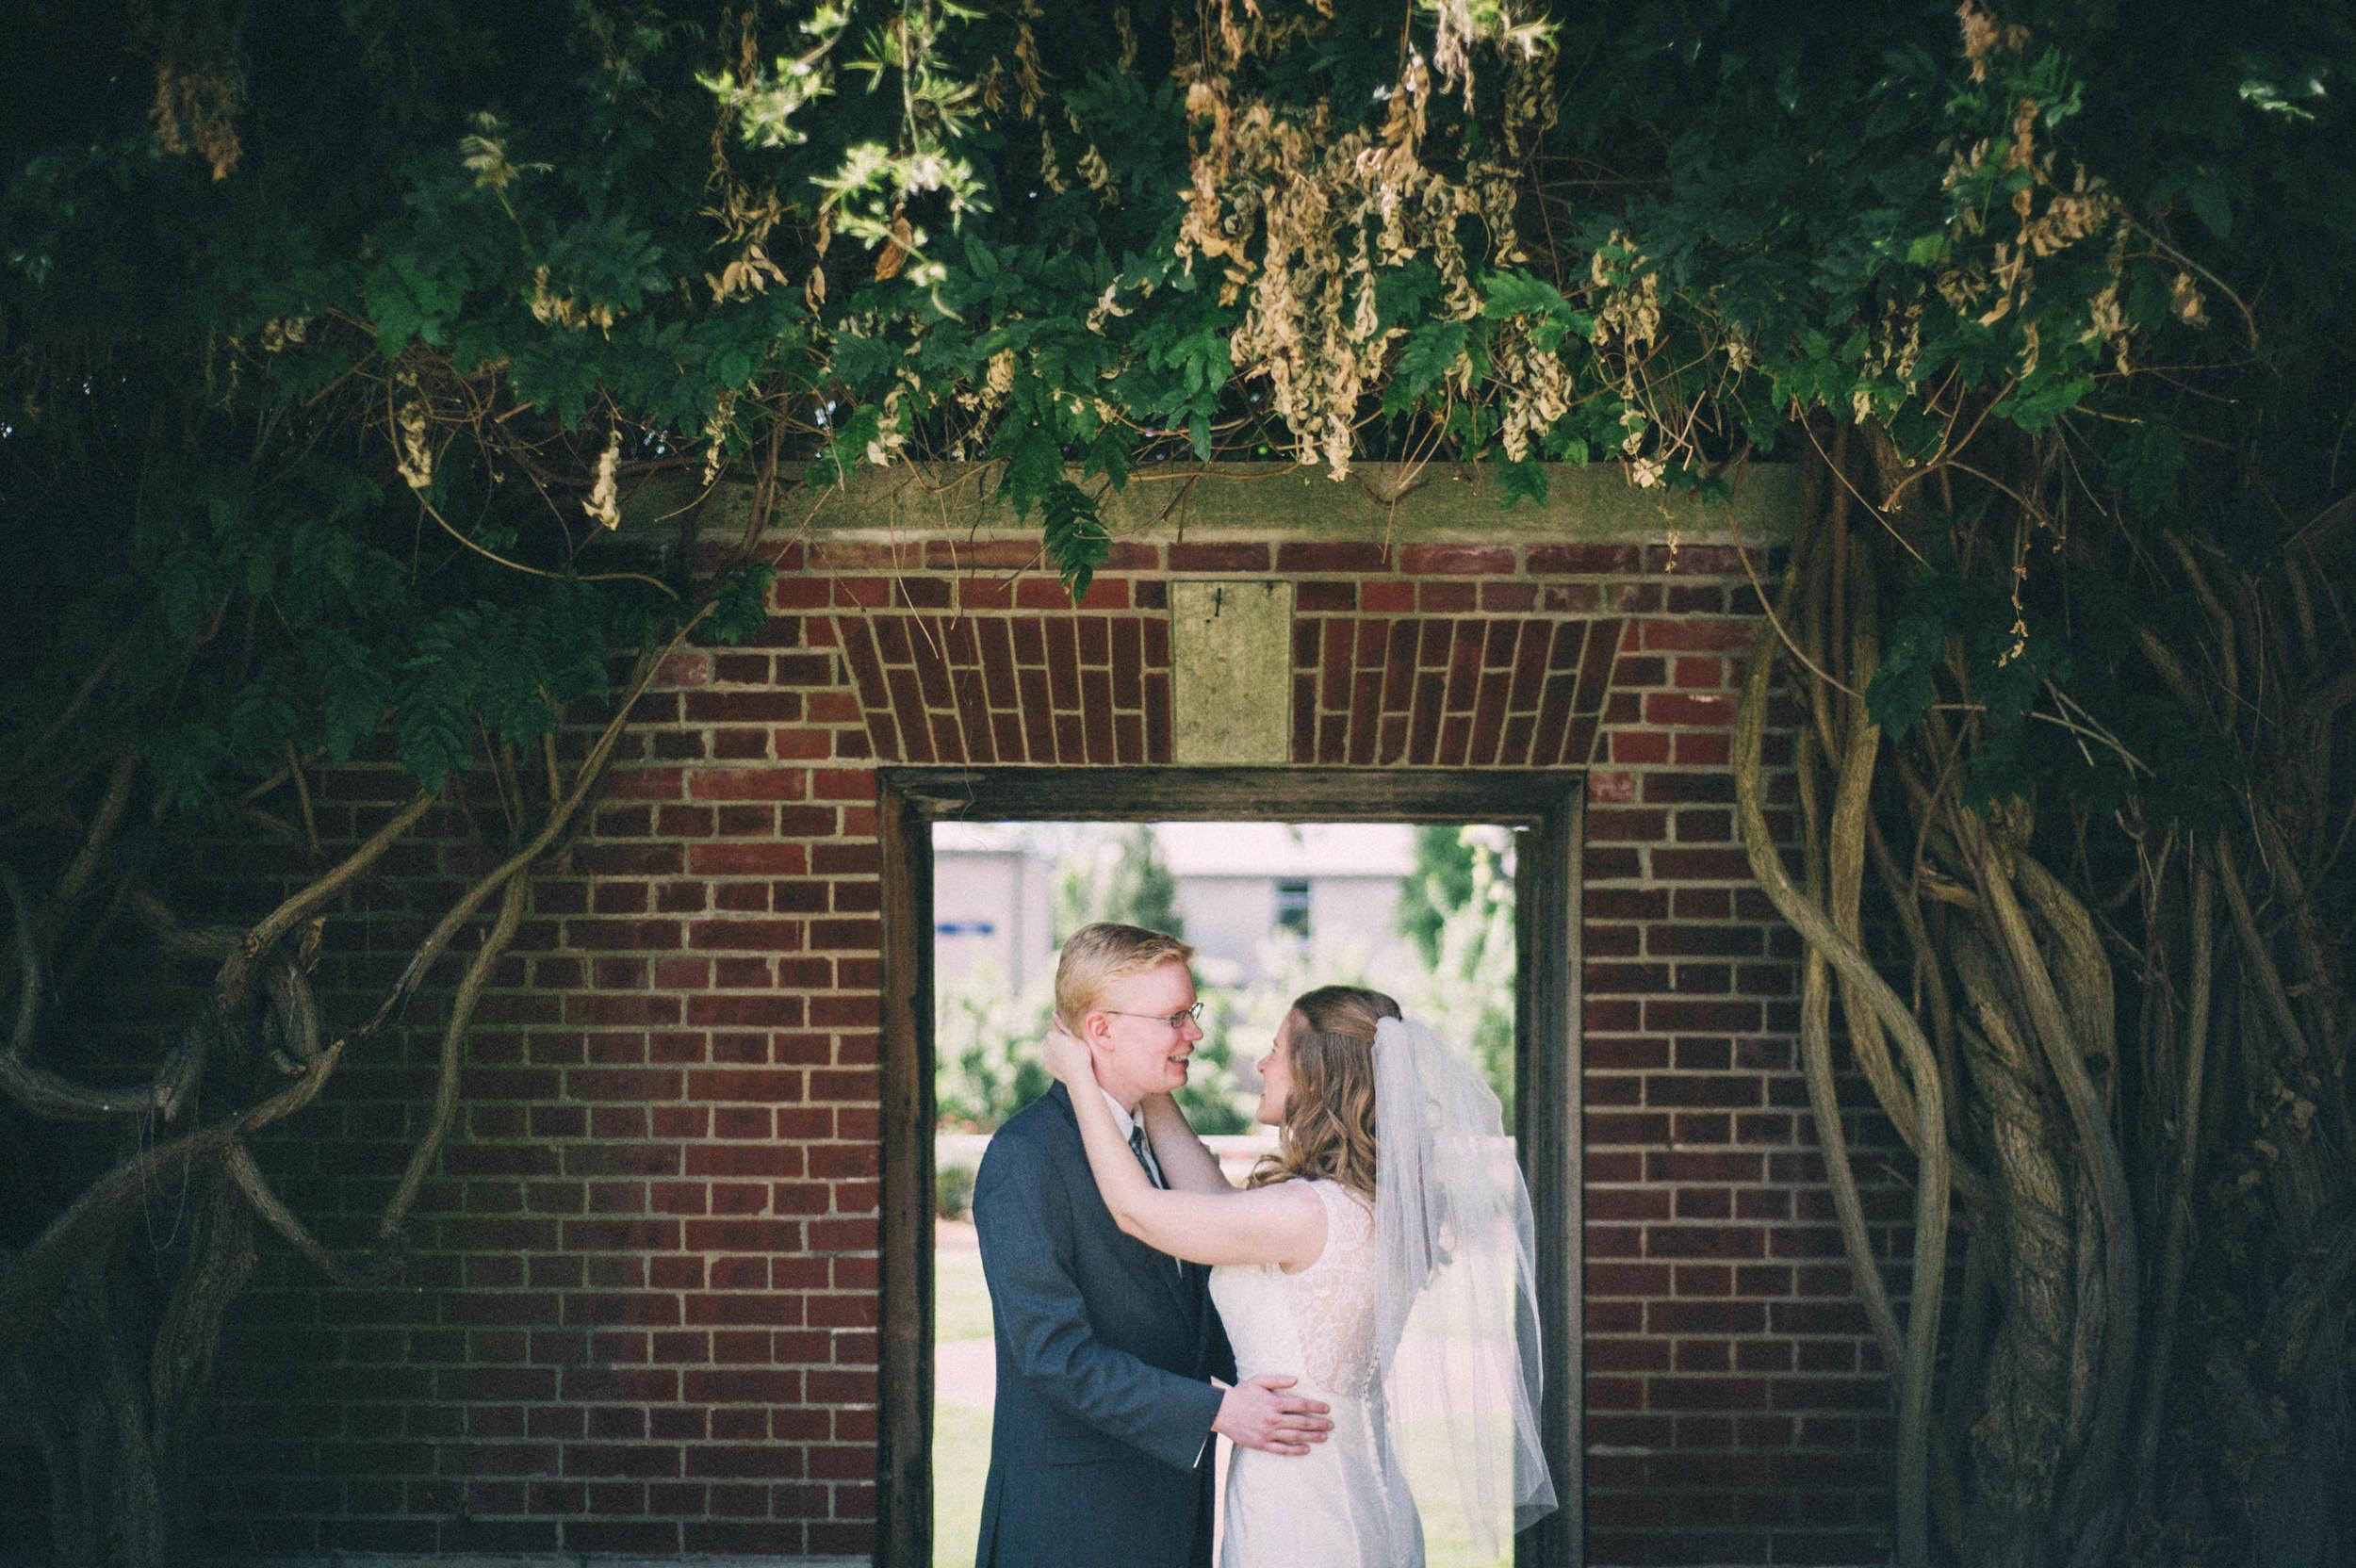 Jenna-Patrick-Garden-Court-Presbyterian-Seminary-Wedding-Louisville-Kentucky-Sarah-Katherine-Davis-Photography-49.jpg